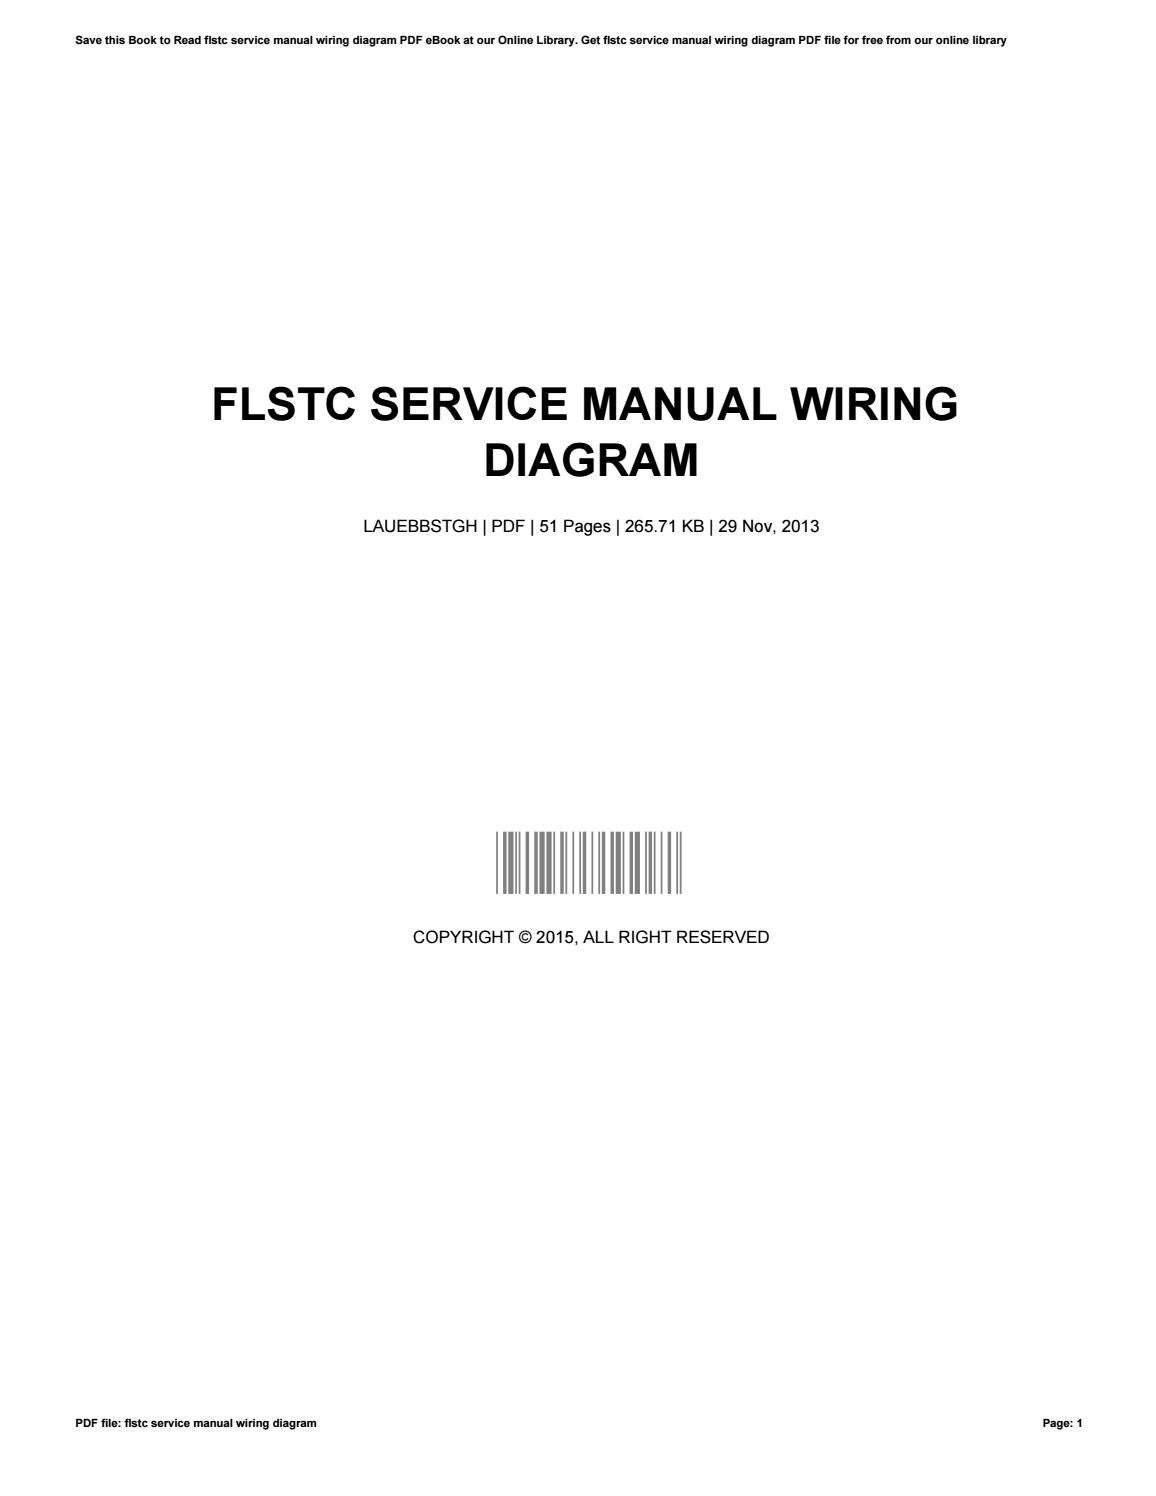 Flstc Service Manual Wiring Diagram By Mariepruett2237